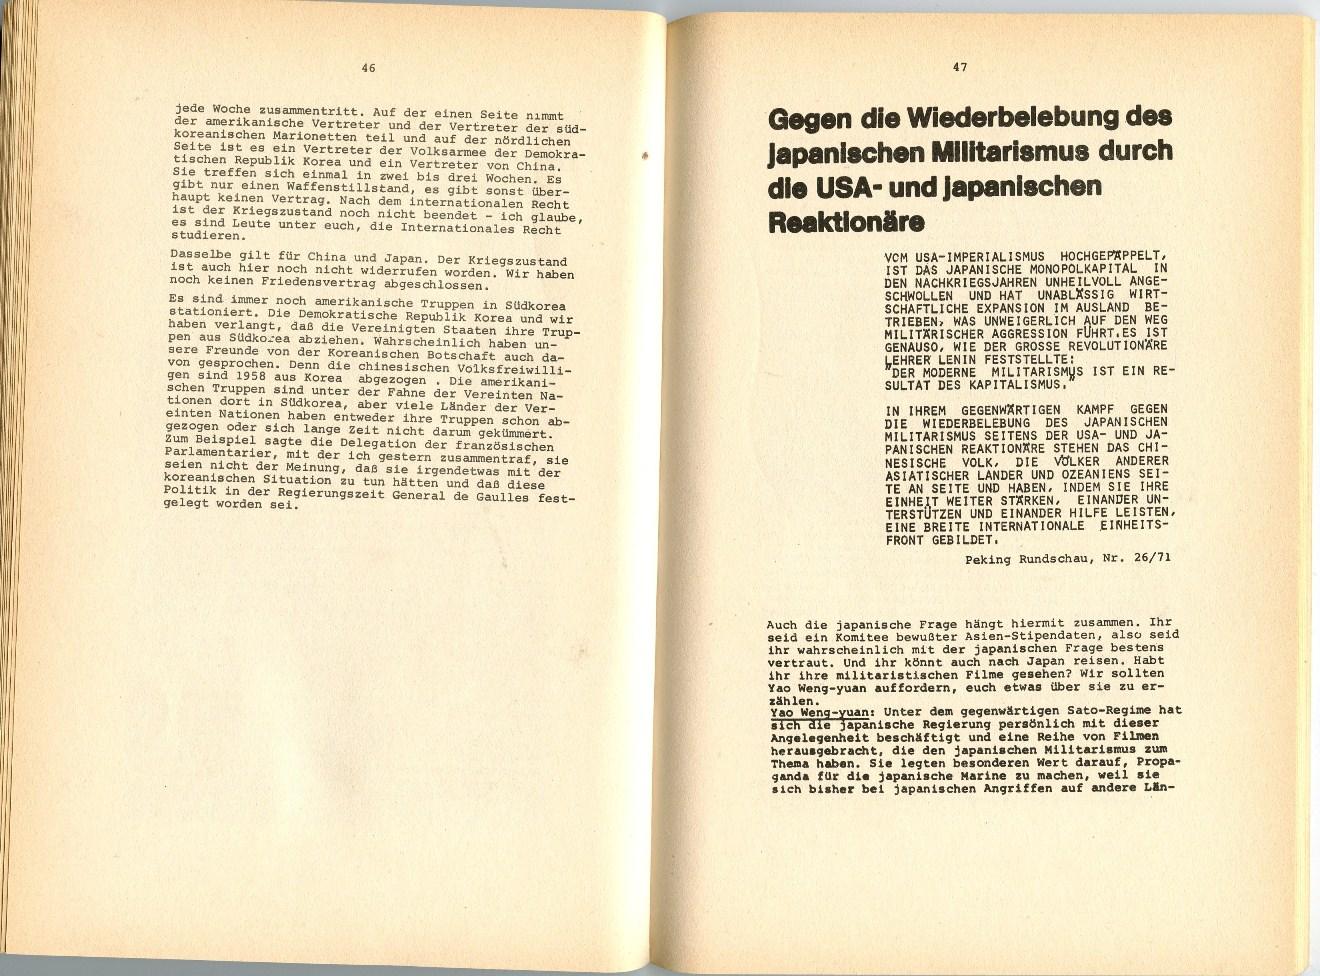 ZB_VRChina_Bollwerk_1971_25